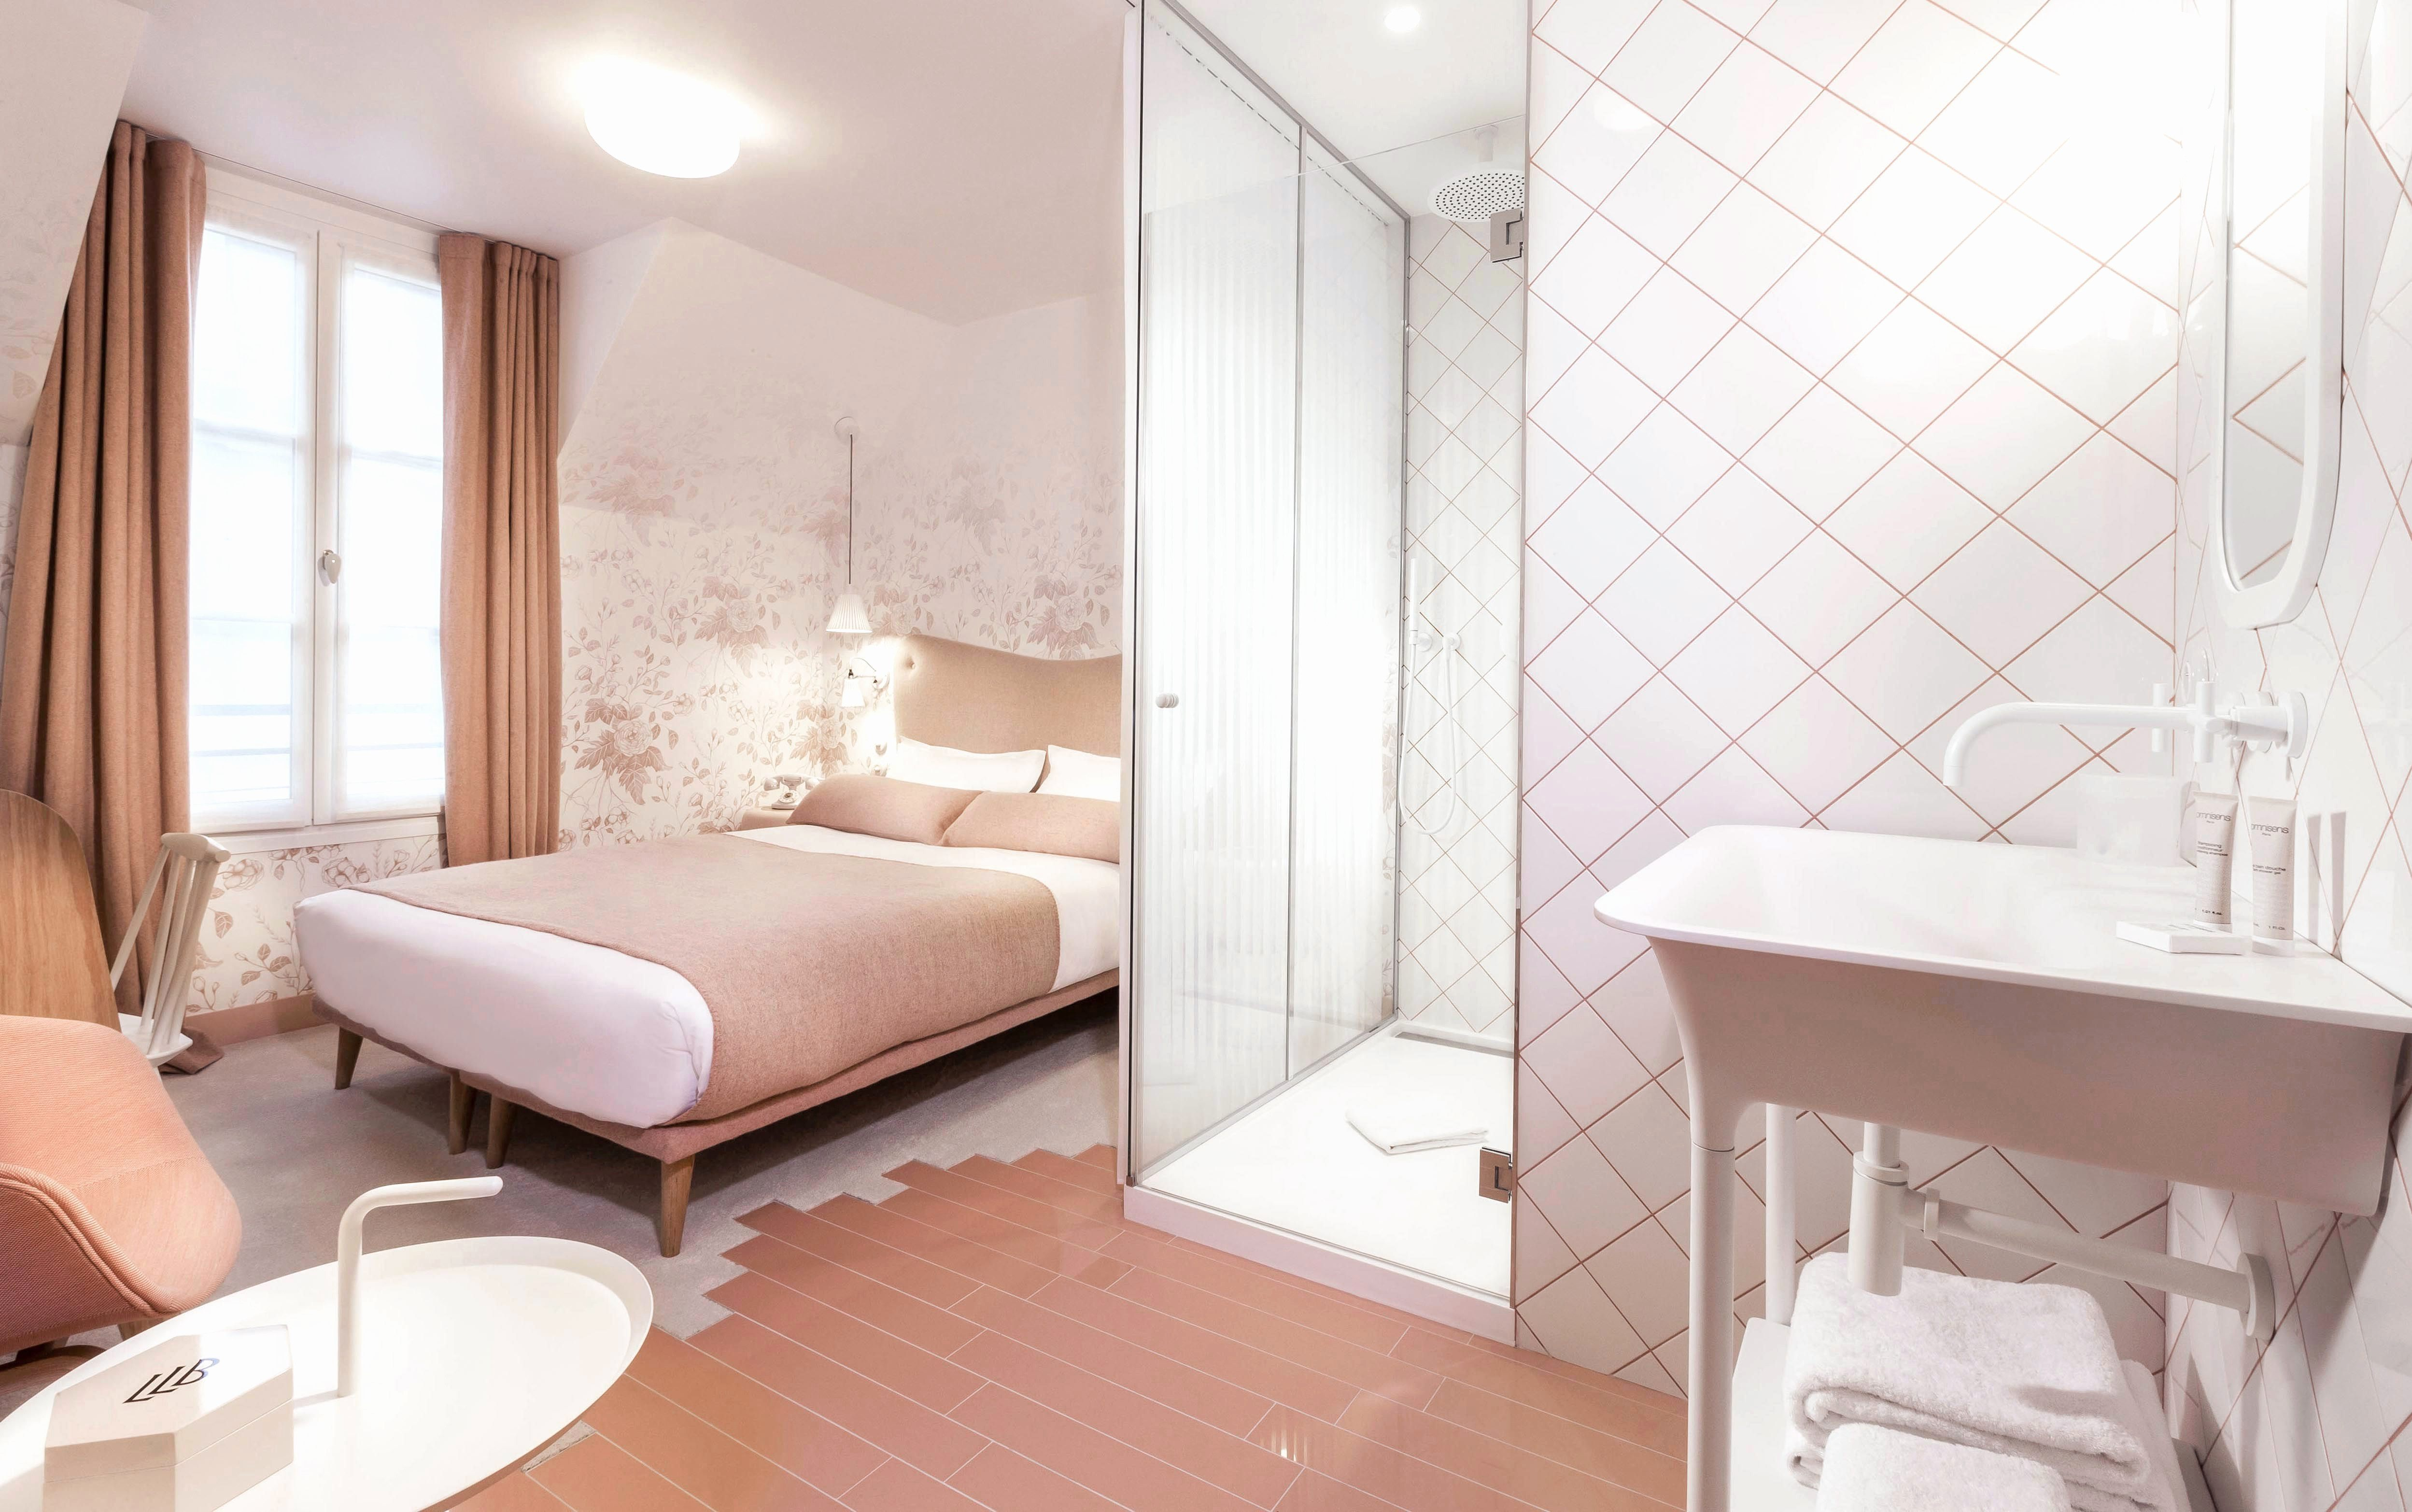 Tete De Lit Hotel Inspirant Tete De Lit Hotel De Luxe Tete De Lit Design as Interior Design